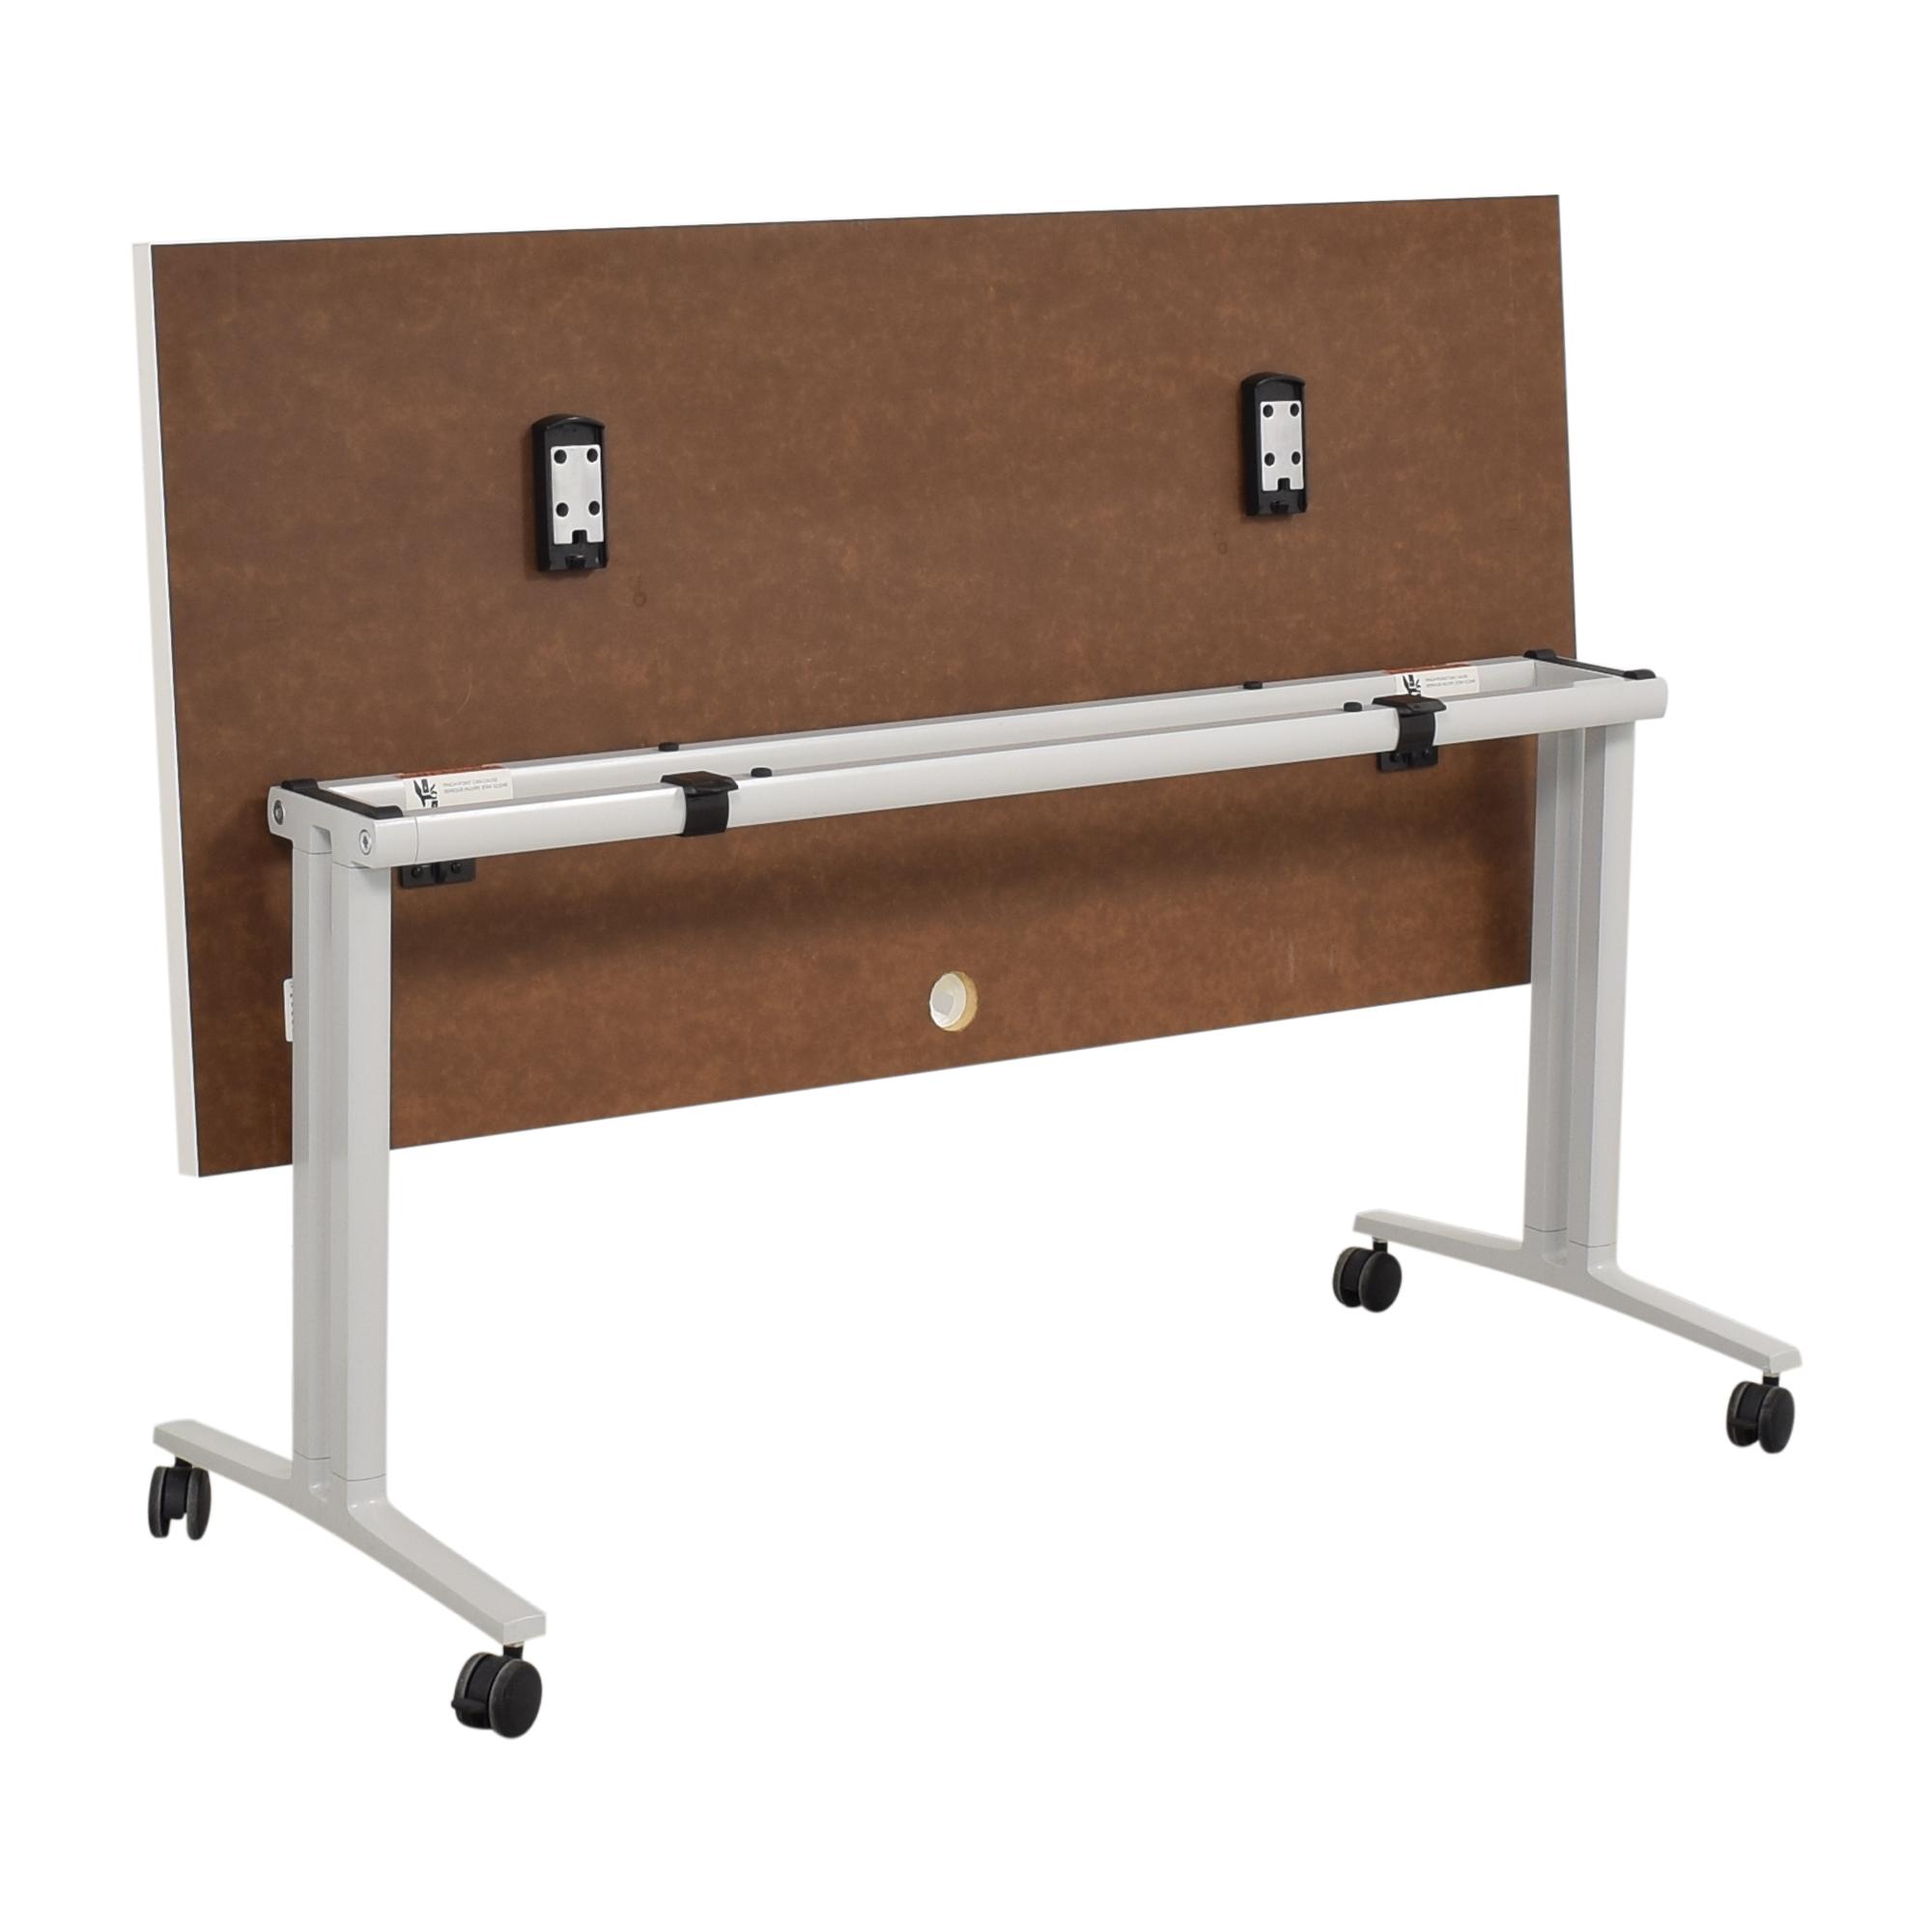 Herman Miller Herman Miller White Everywhere Tables Flip-Top Desk used